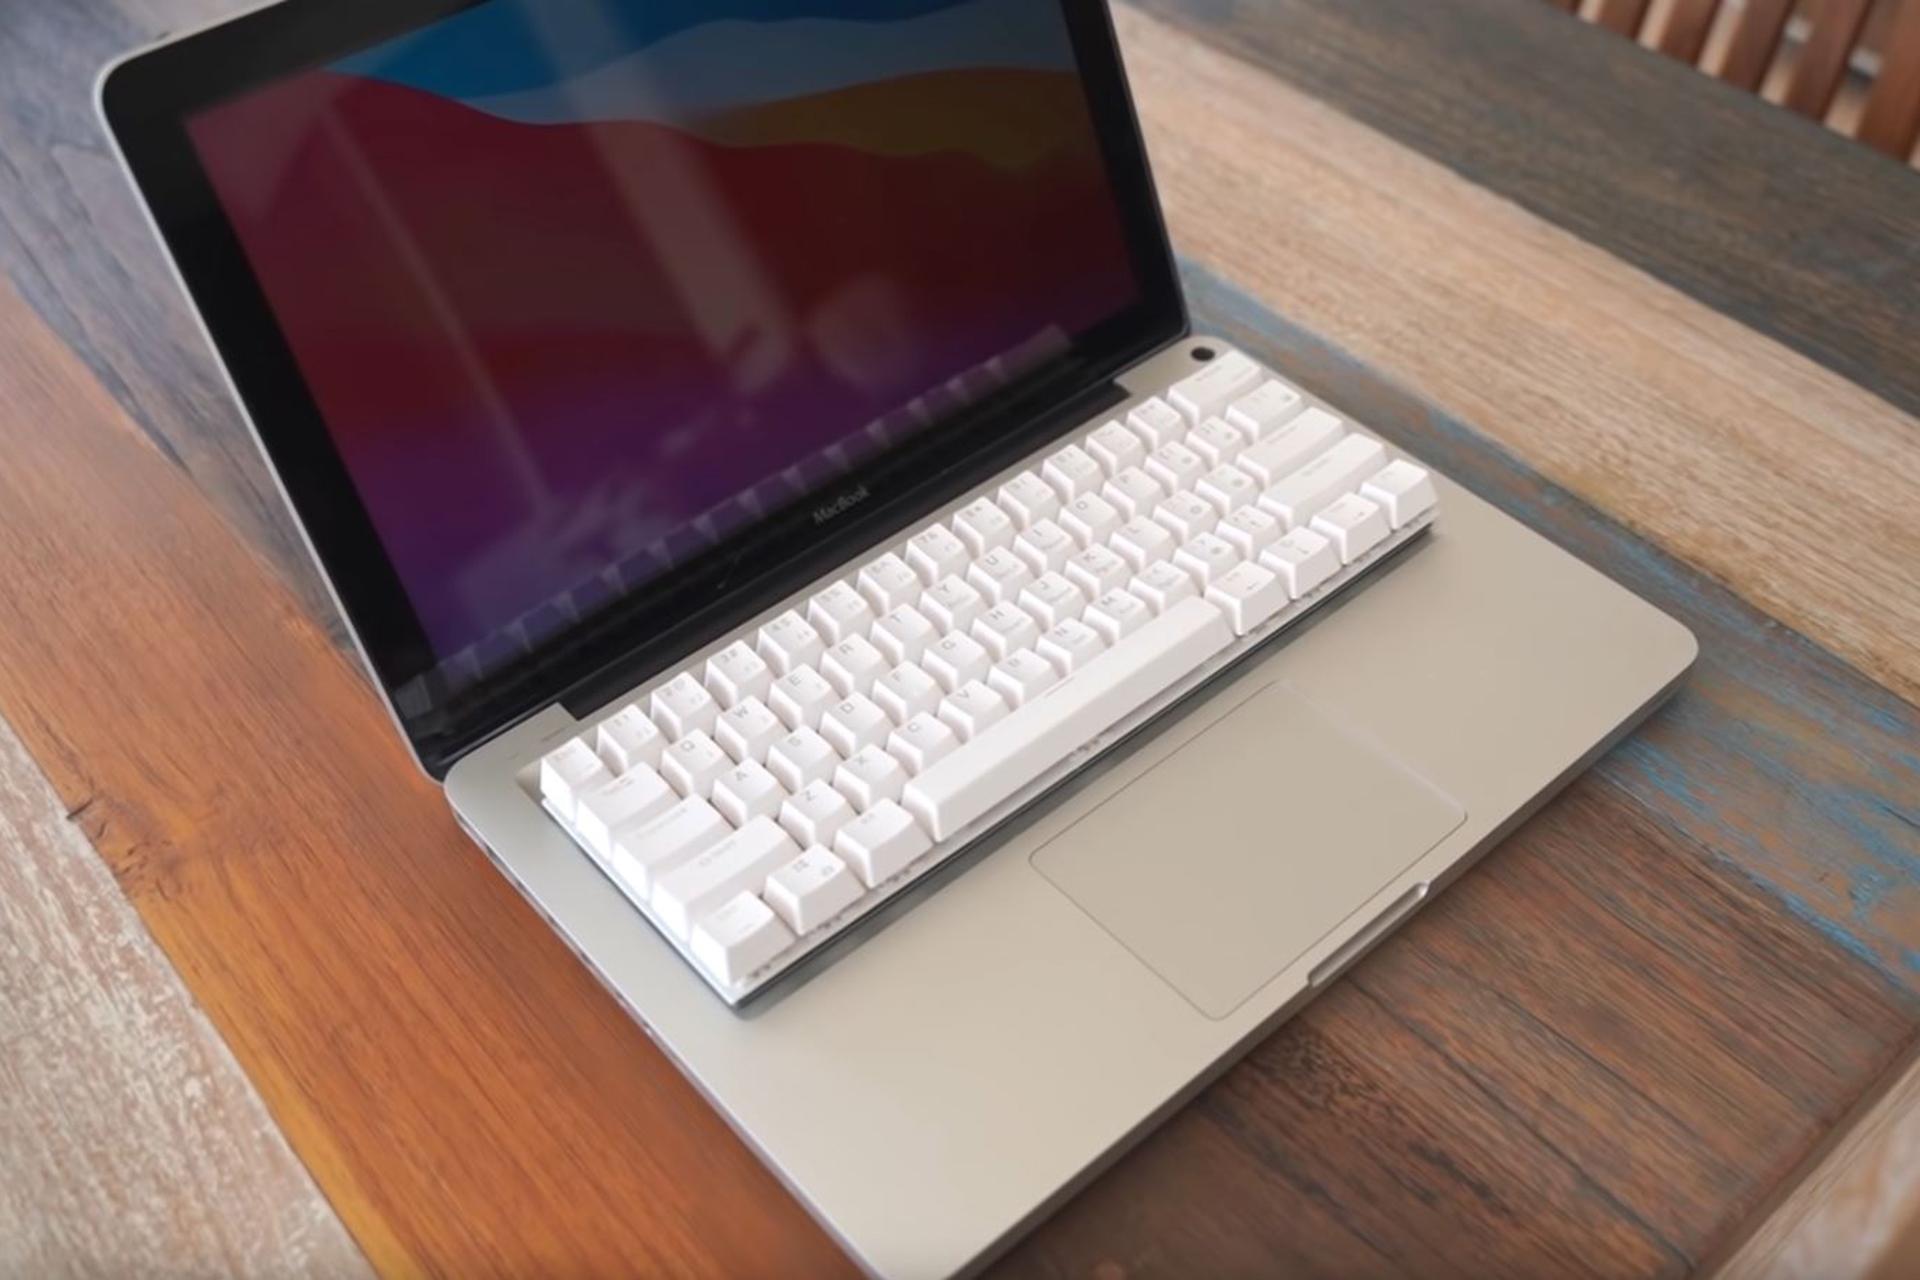 Mechanische Tastatur macht MacBook zum MechBook